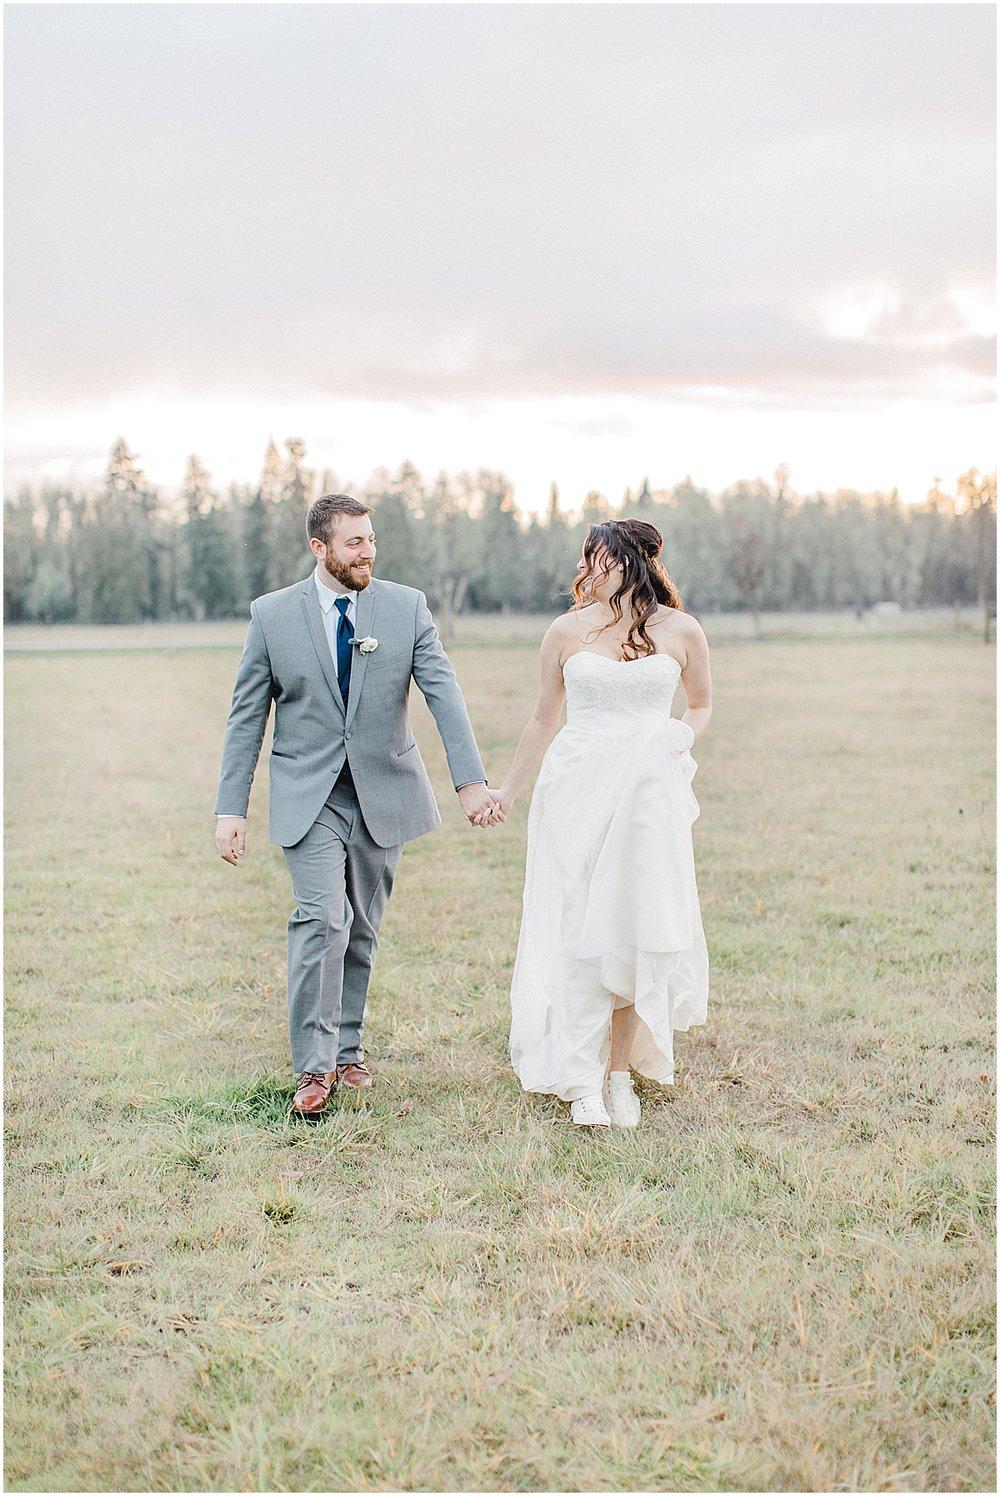 Chehalis Washington Winter Wedding Silver and White | Willapa Hills Farm Wedding | Eastham | Emma Rose Company PNW Light and Airy Wedding Photographer_0088.jpg